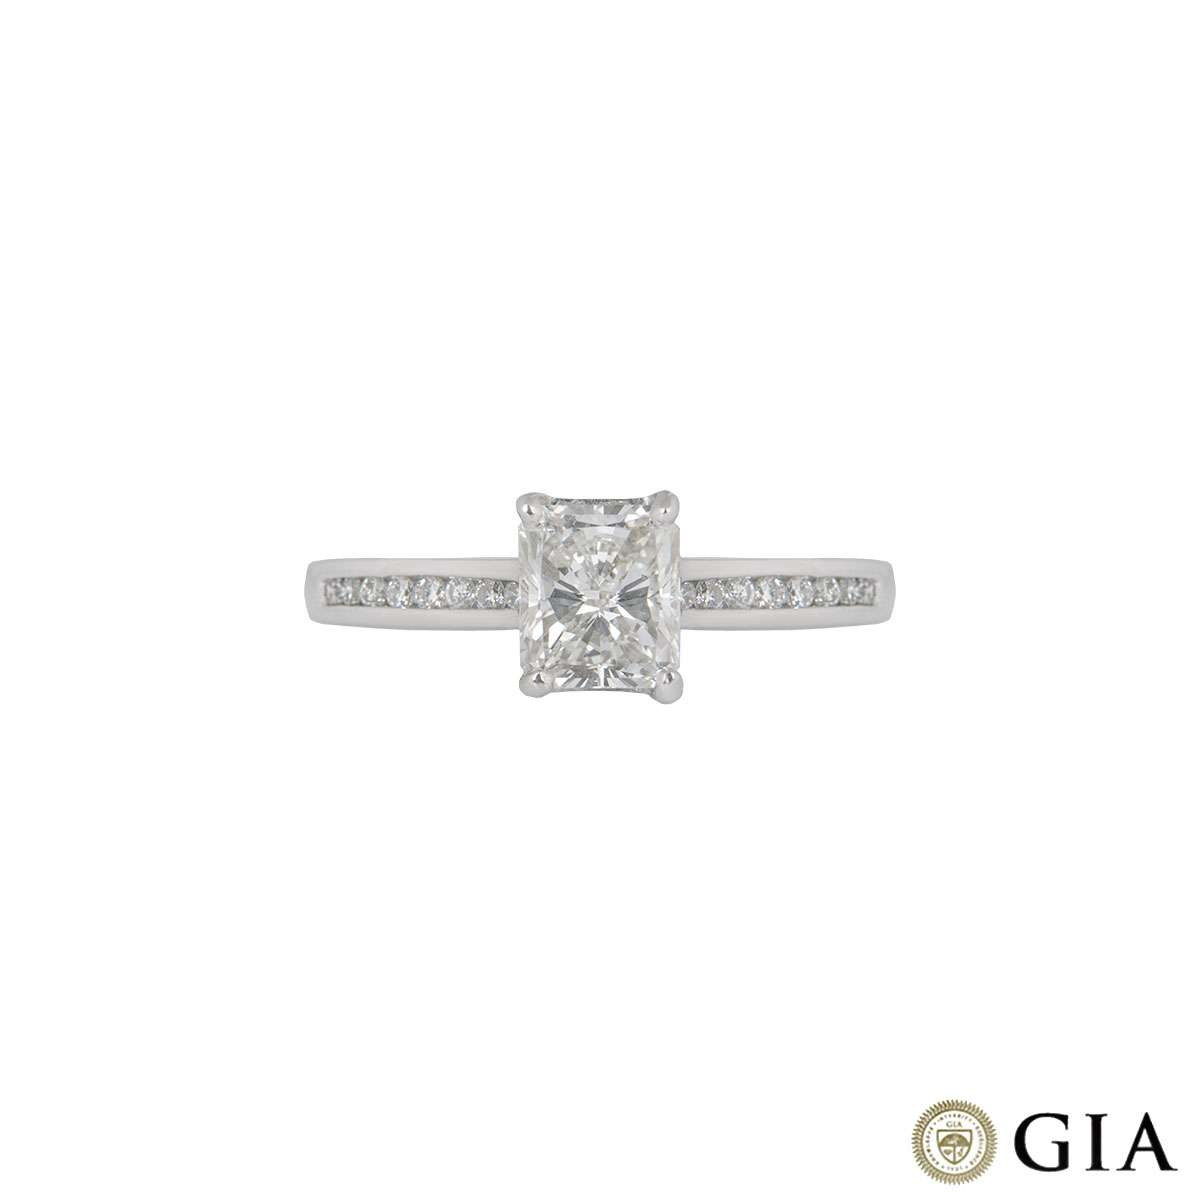 White Gold Radiant Cut Diamond Ring 1.01ct H/SI1